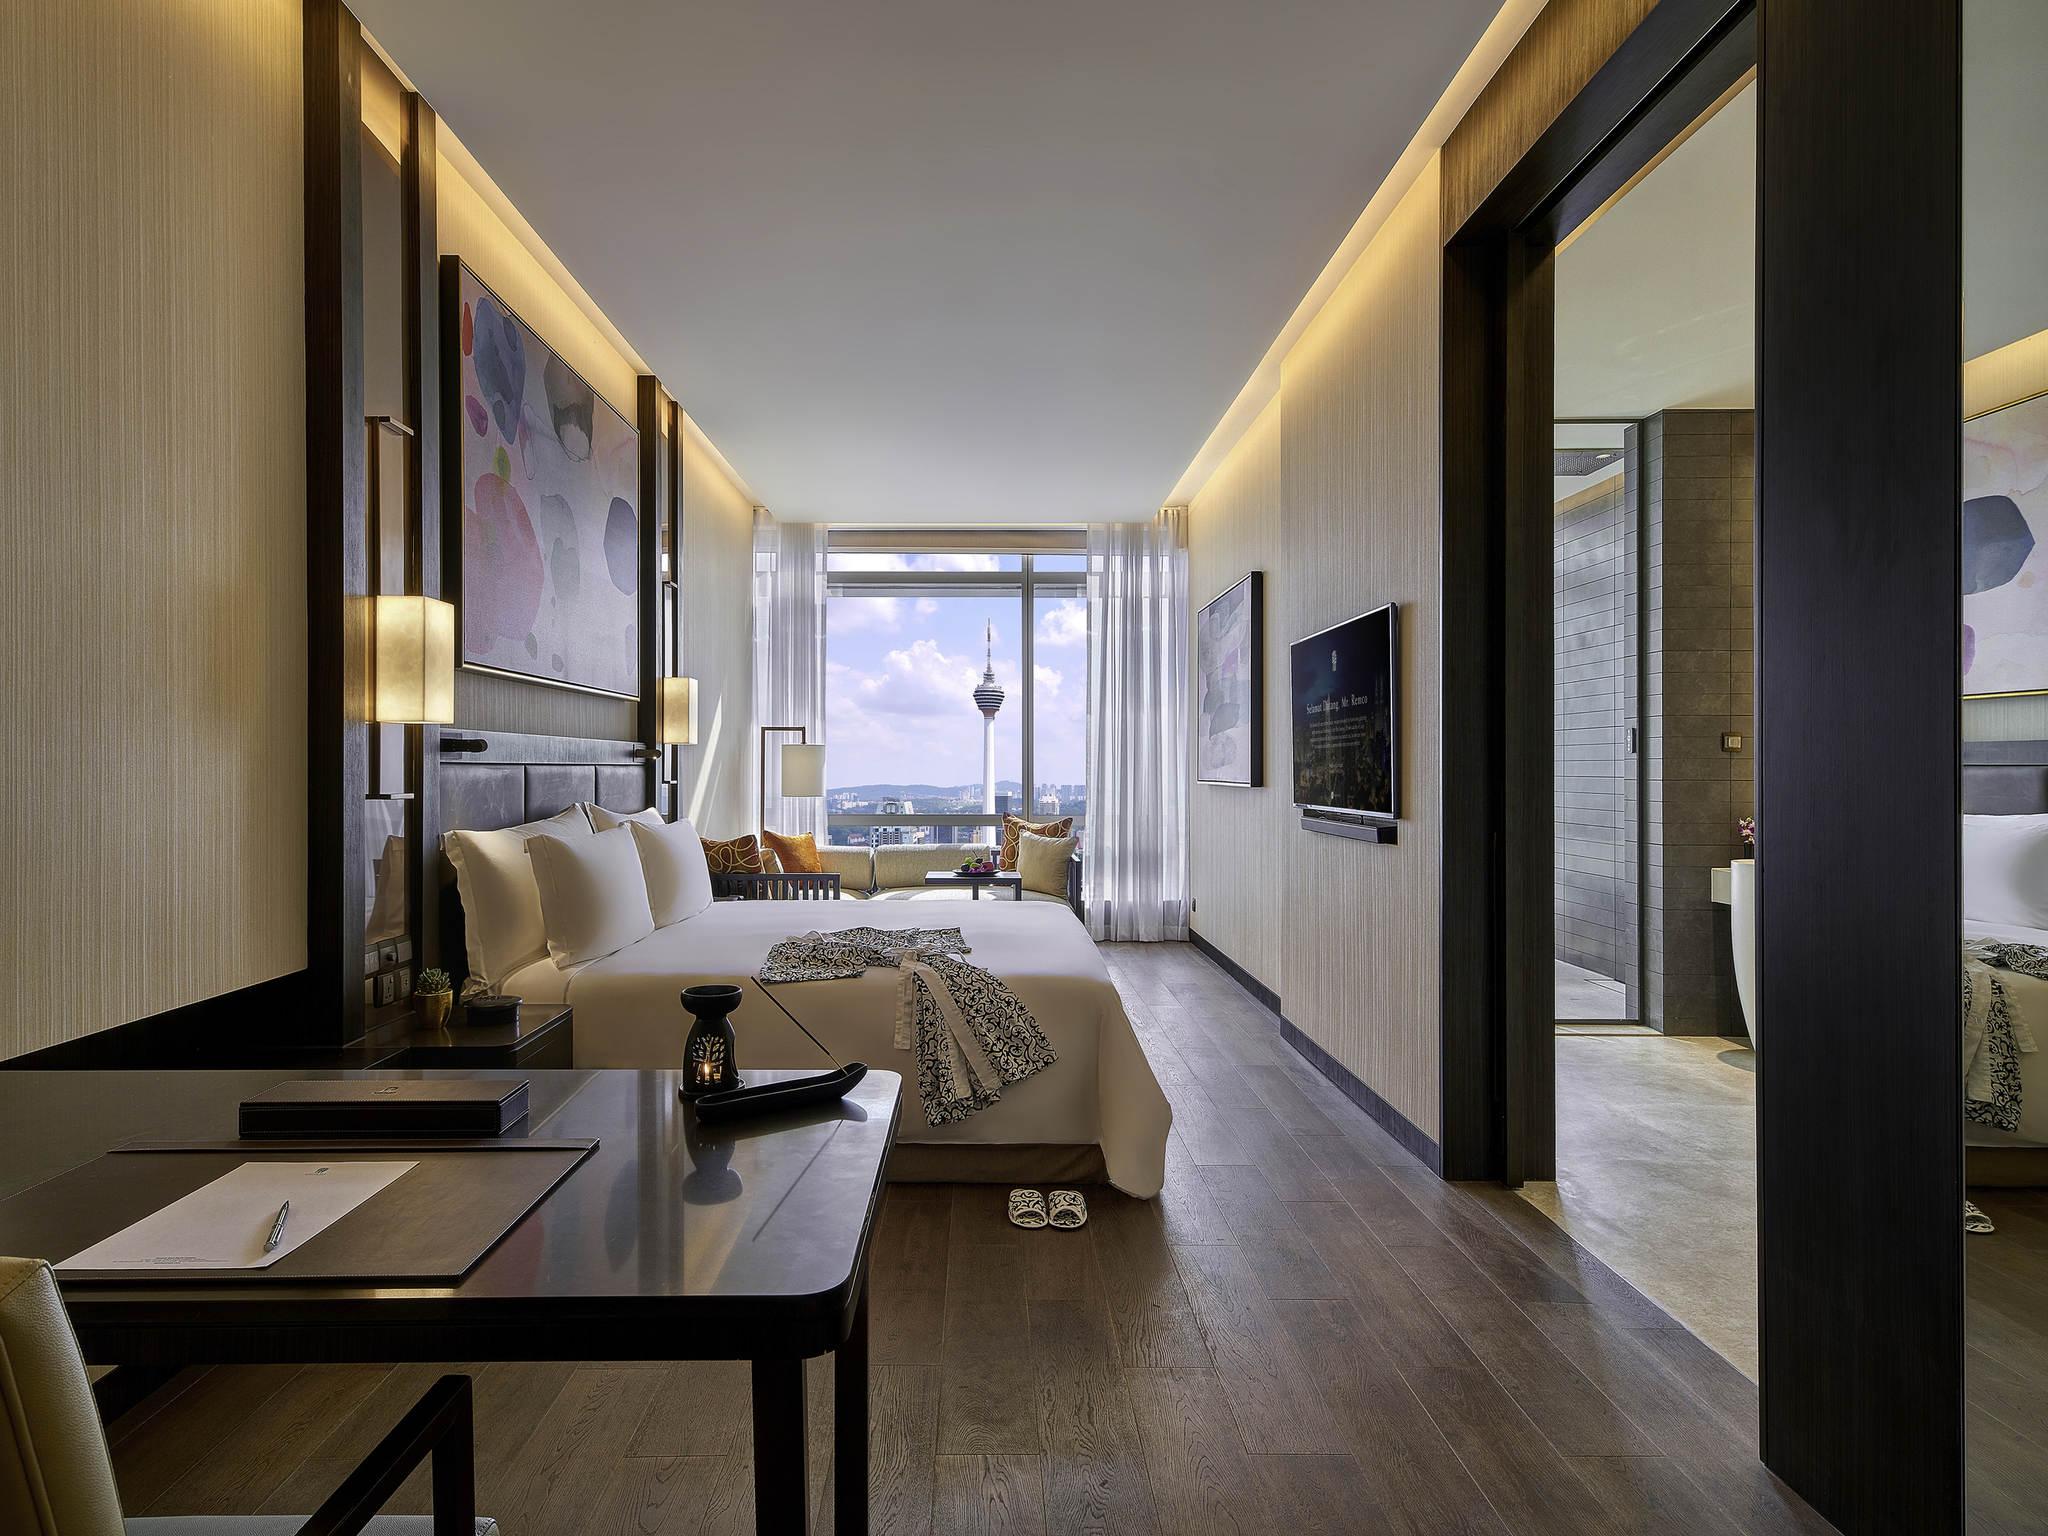 Banyan Tree Hotel Gallery - 4